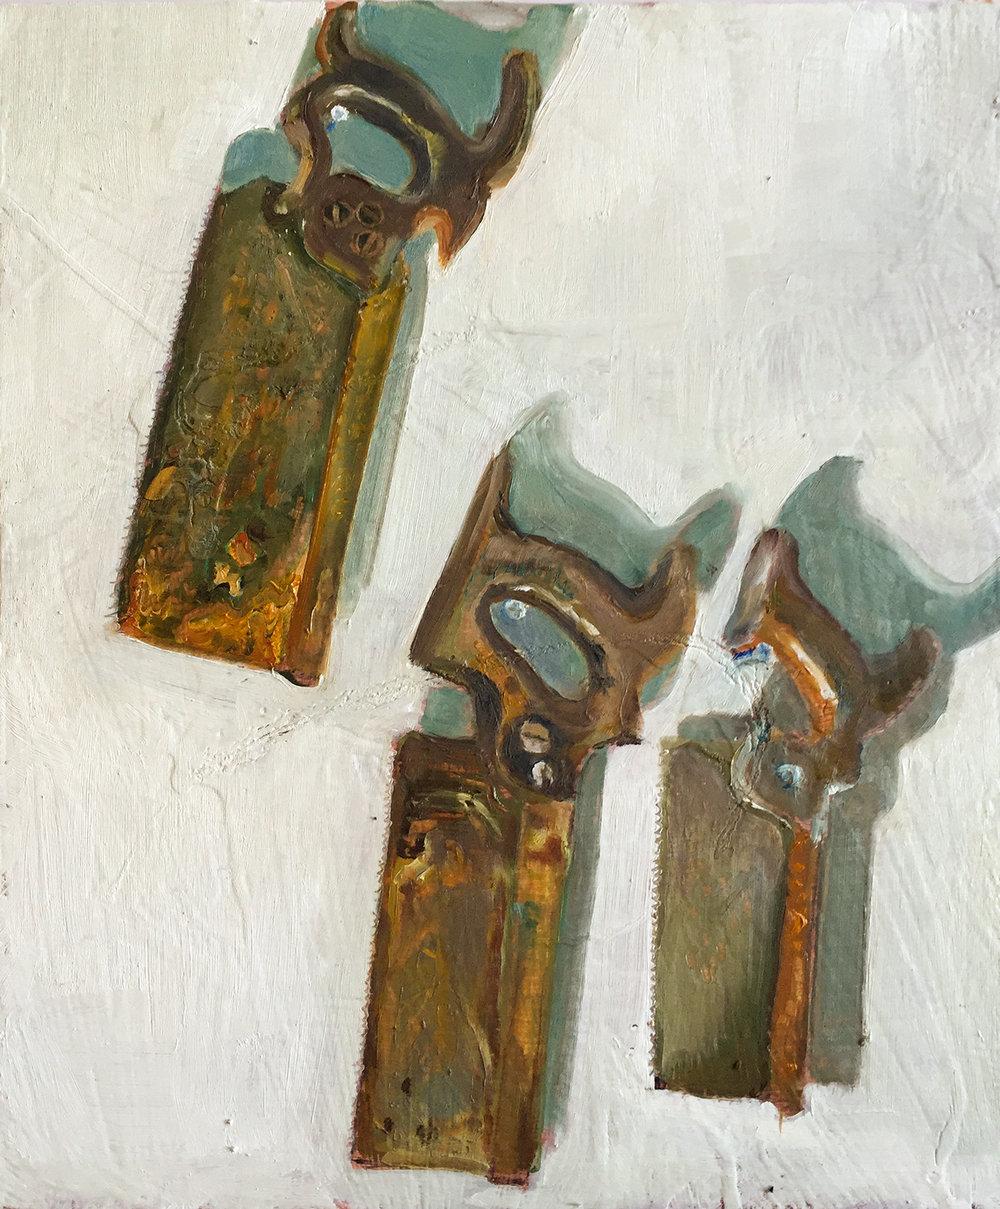 Artist: Tori Day  Title: The Old Workshop  Size: 32.5 x 27.5 cm  Medium: Oil on panel  Price: £550